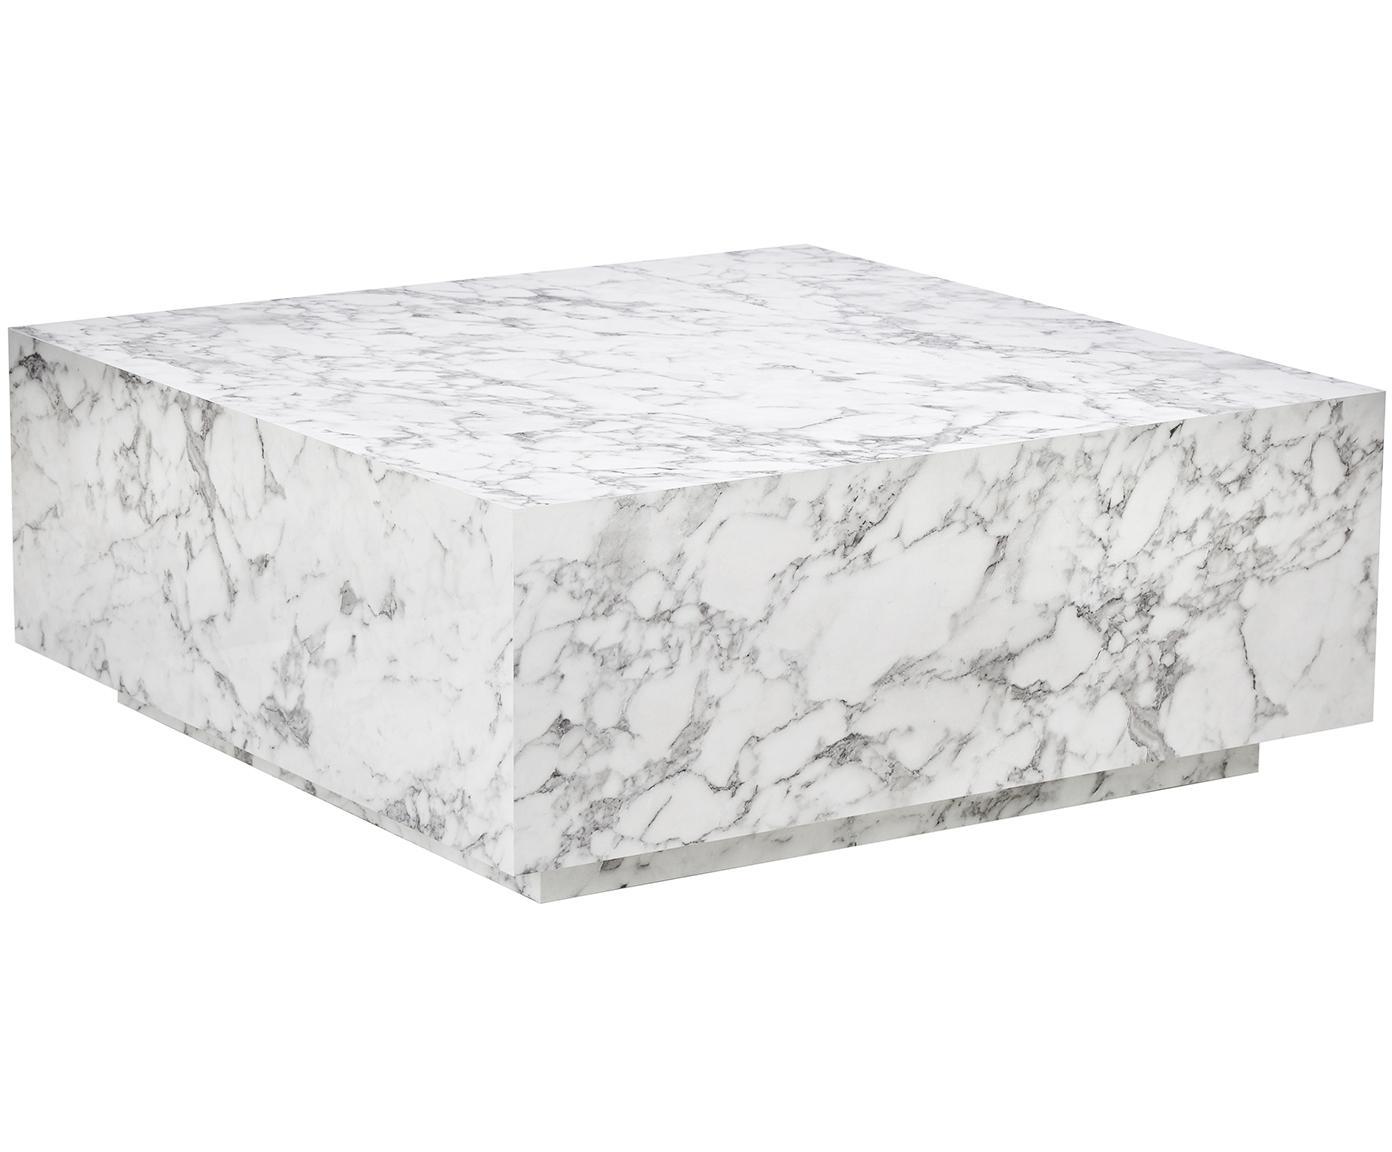 Zwevende salontafel Lesley met marmerlook, MDF bekleed met melaminefolie, Wit, gemarmerd, glanzend, B 90 x D 90 cm